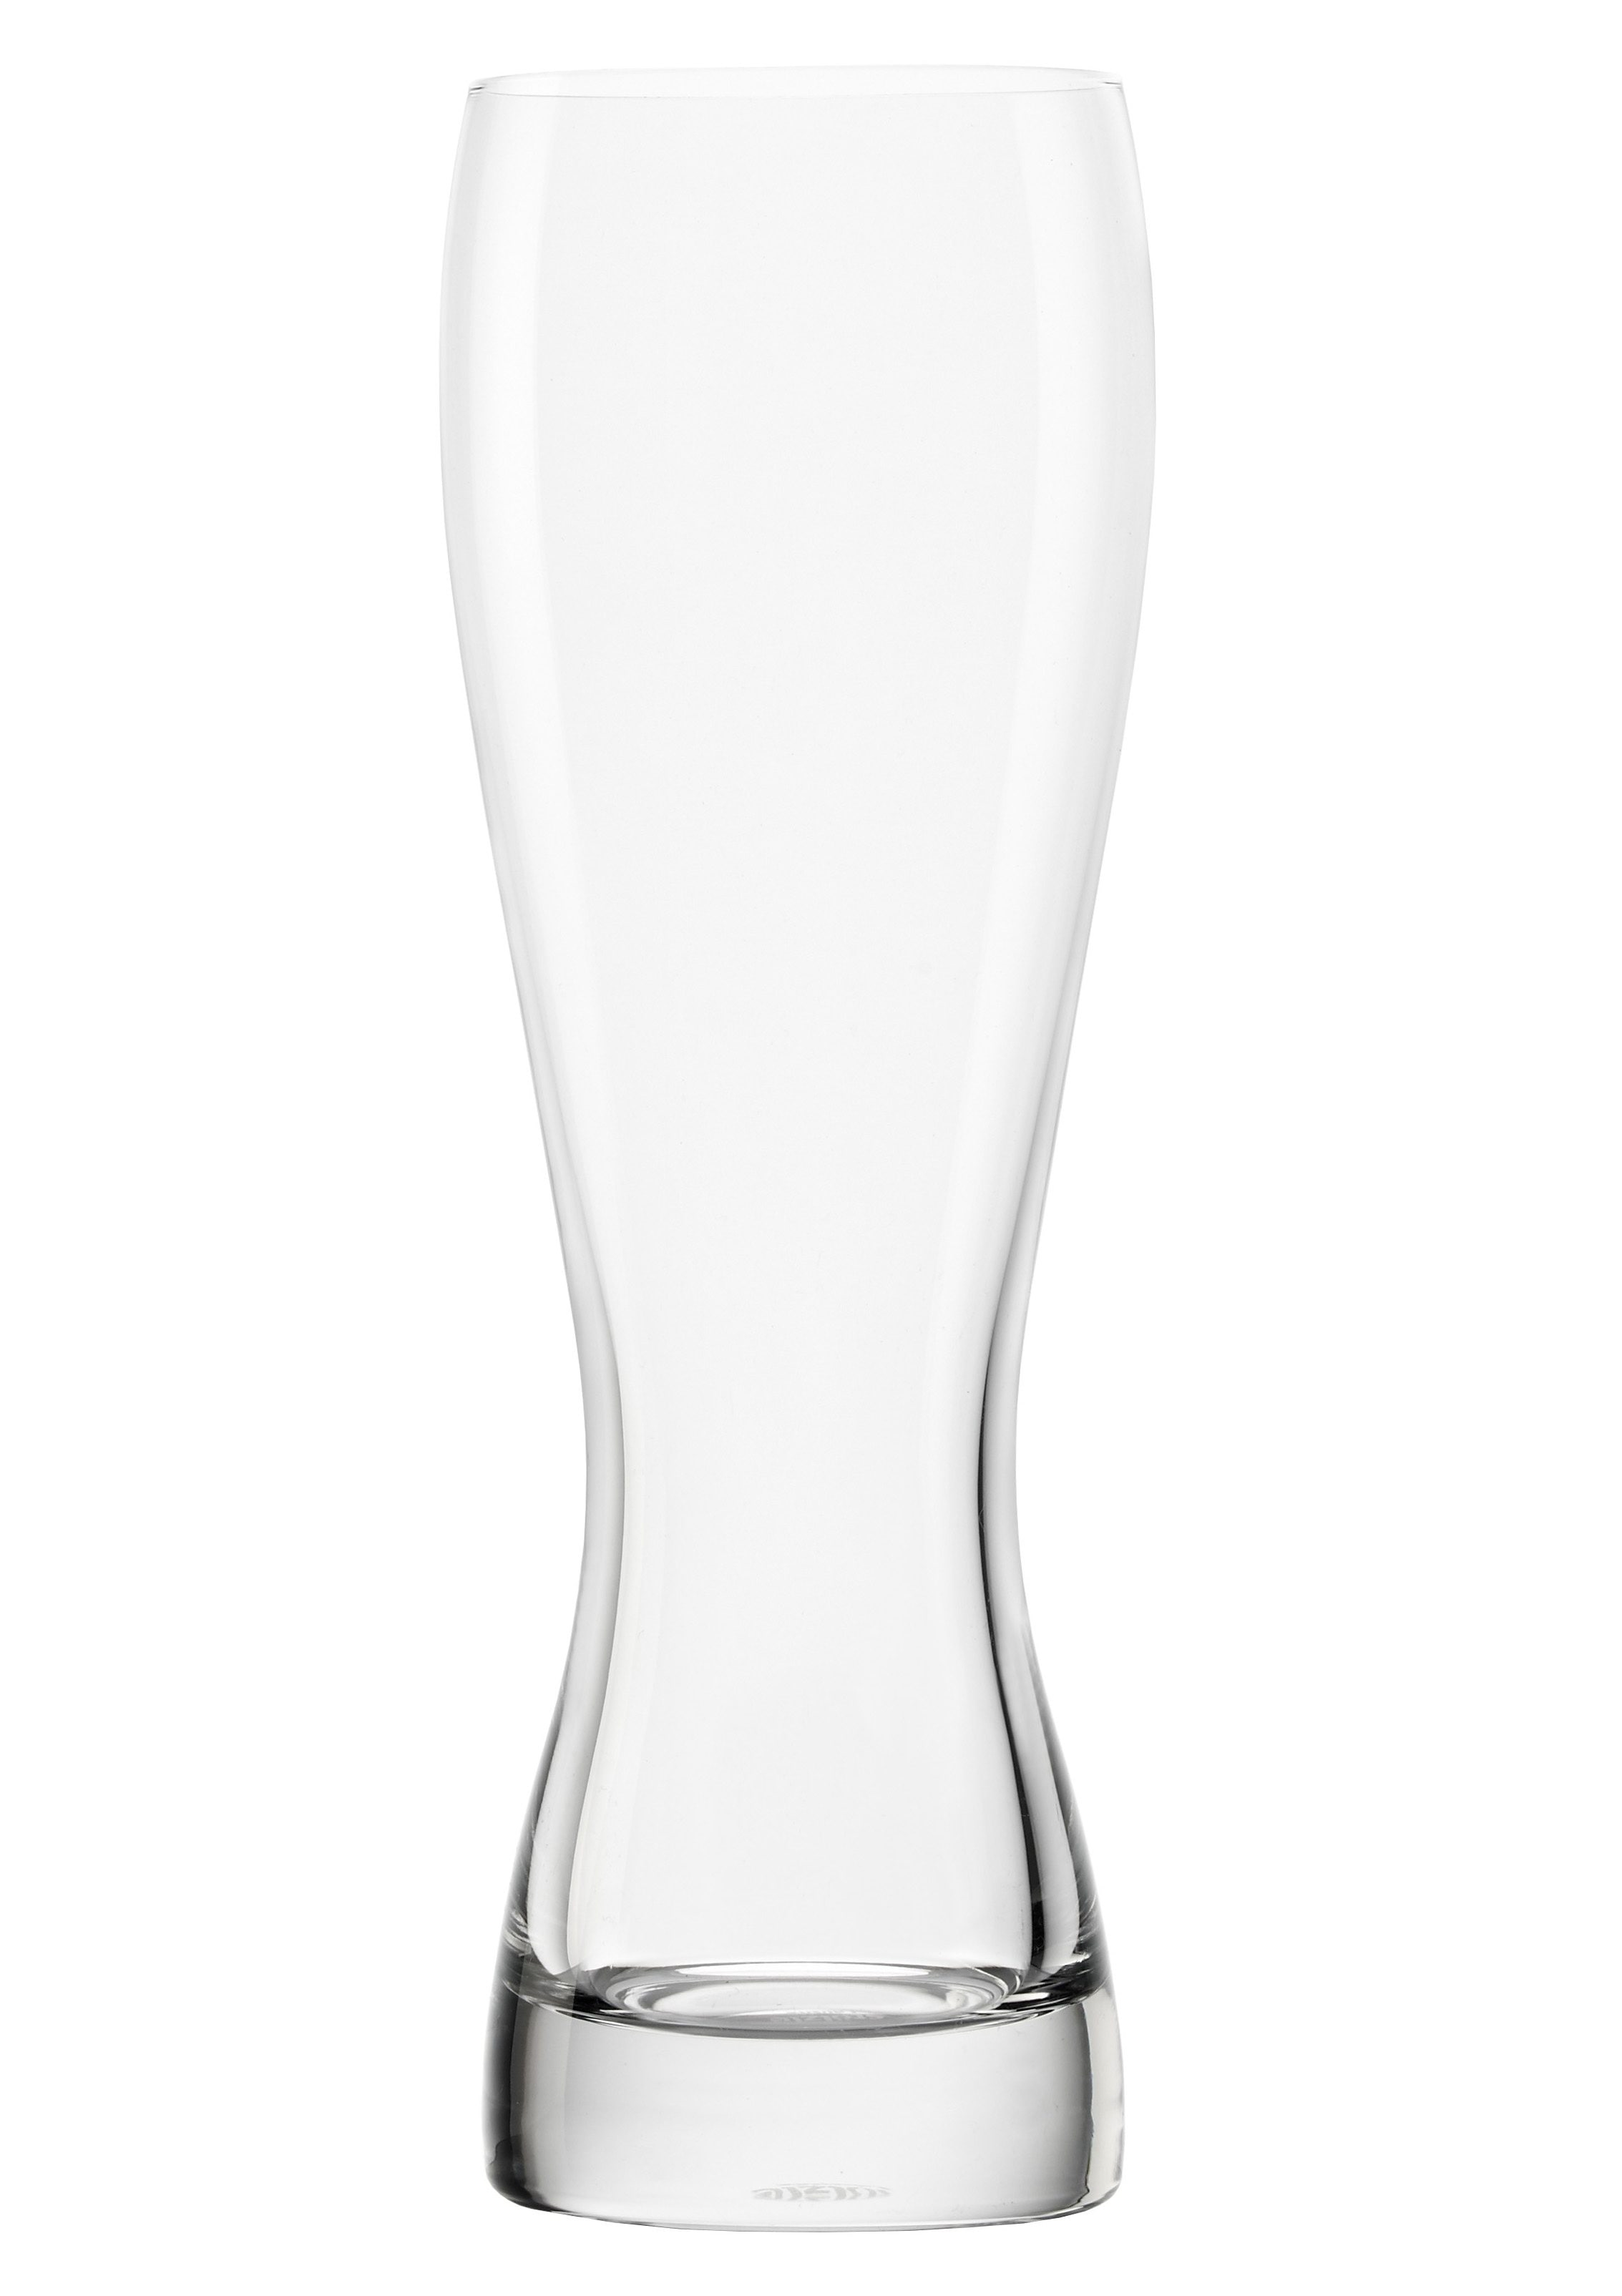 Stölzle Bierglas, (Set, 6 tlg.) farblos Kristallgläser Gläser Glaswaren Haushaltswaren Bierglas